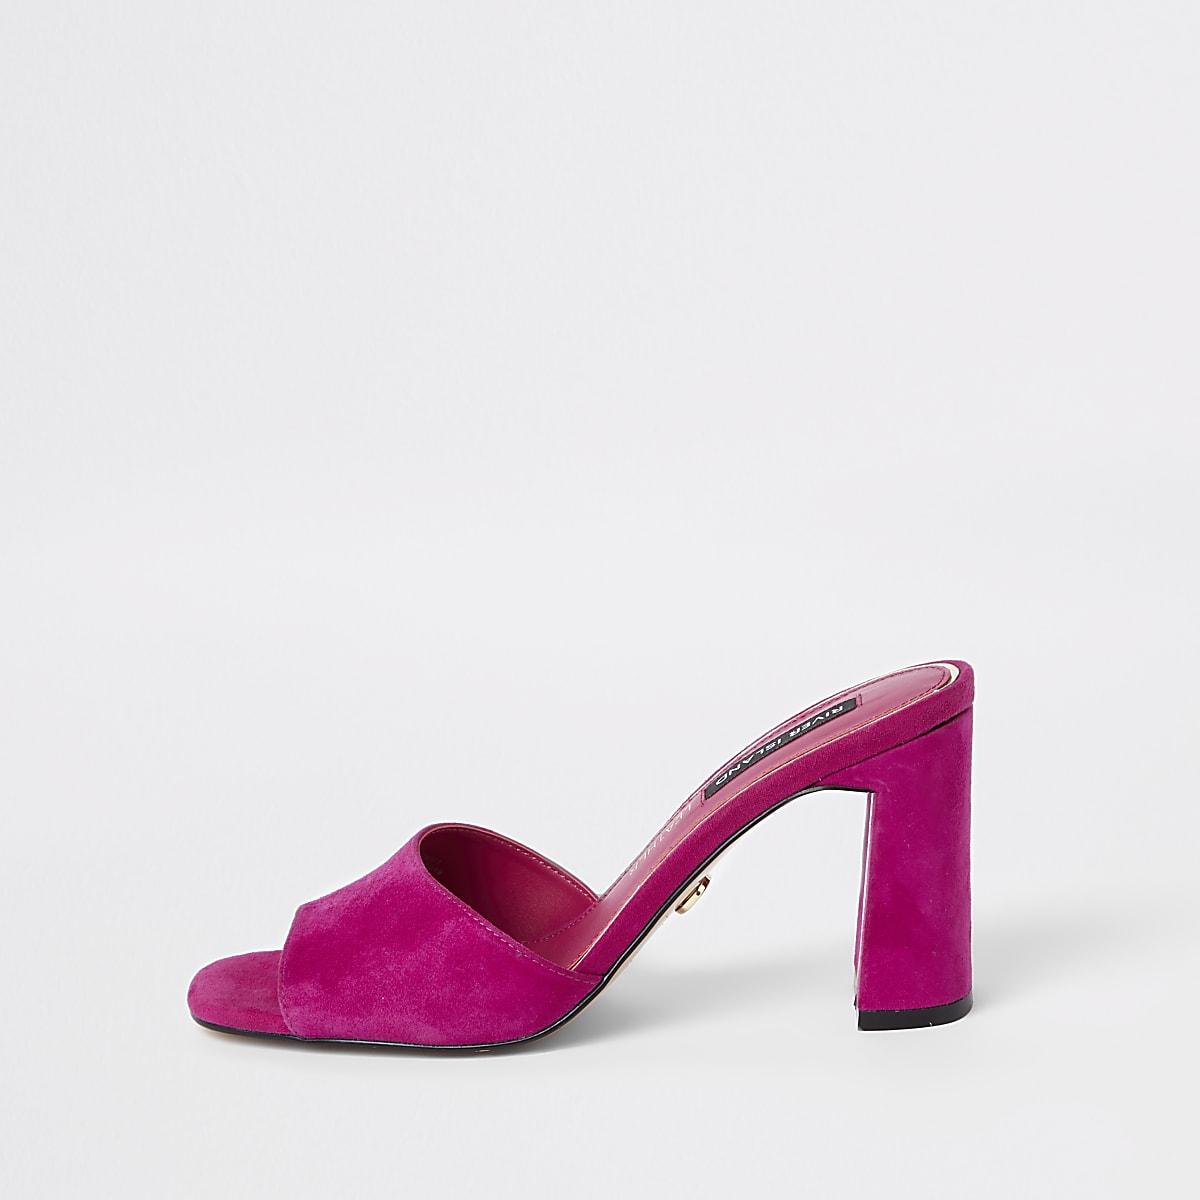 Pink suede mule sandals